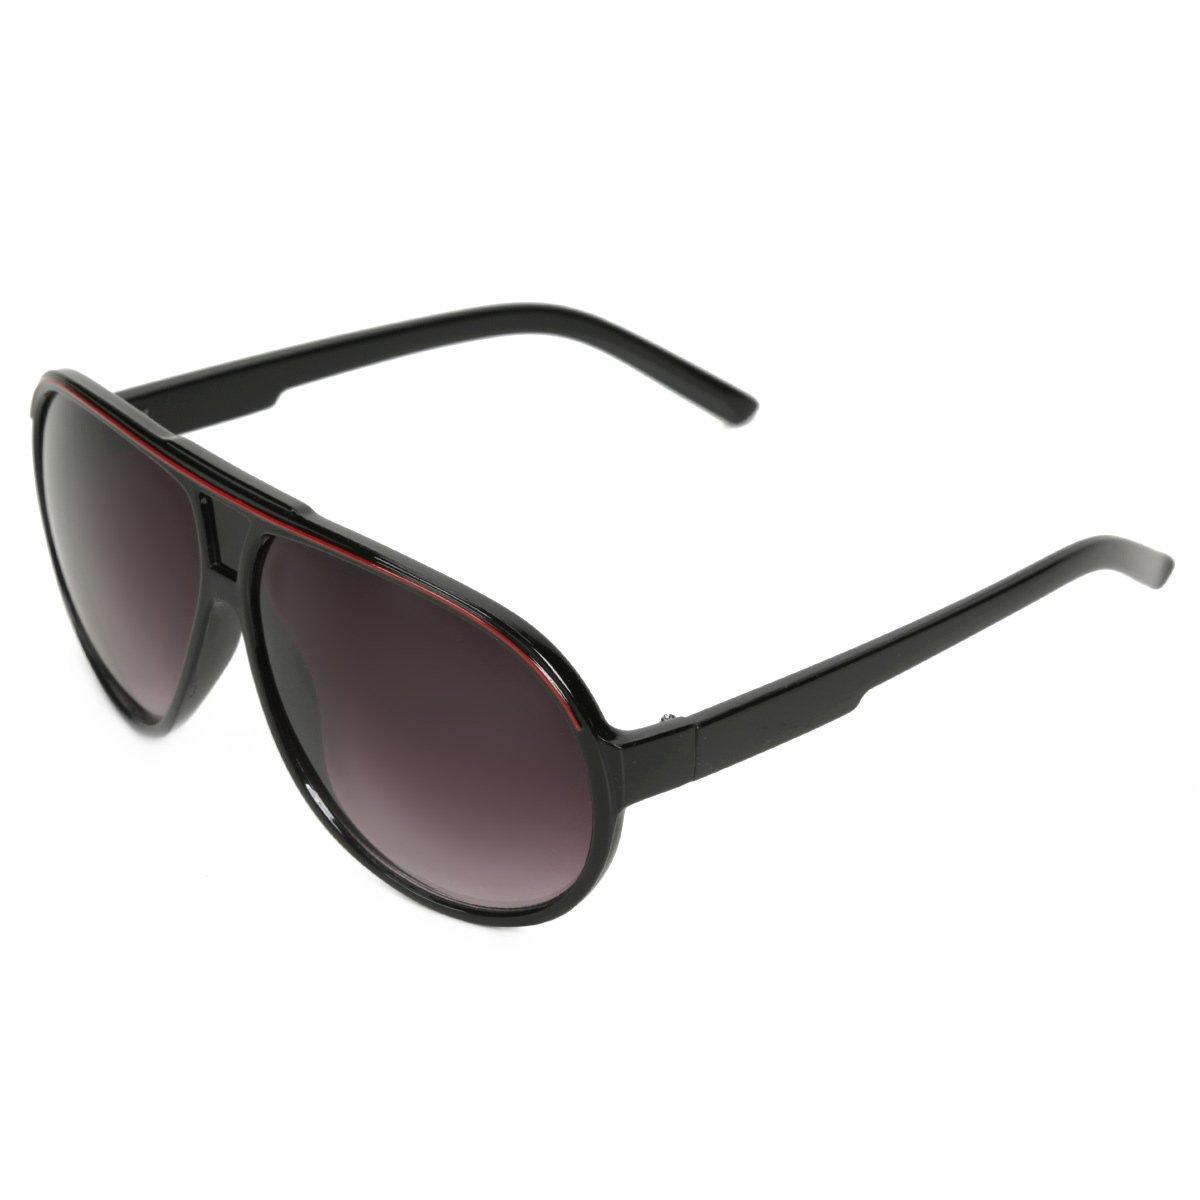 029e4aea776b4 Óculos Moto Gp Pro Fast Turbo 06 - Compre Agora